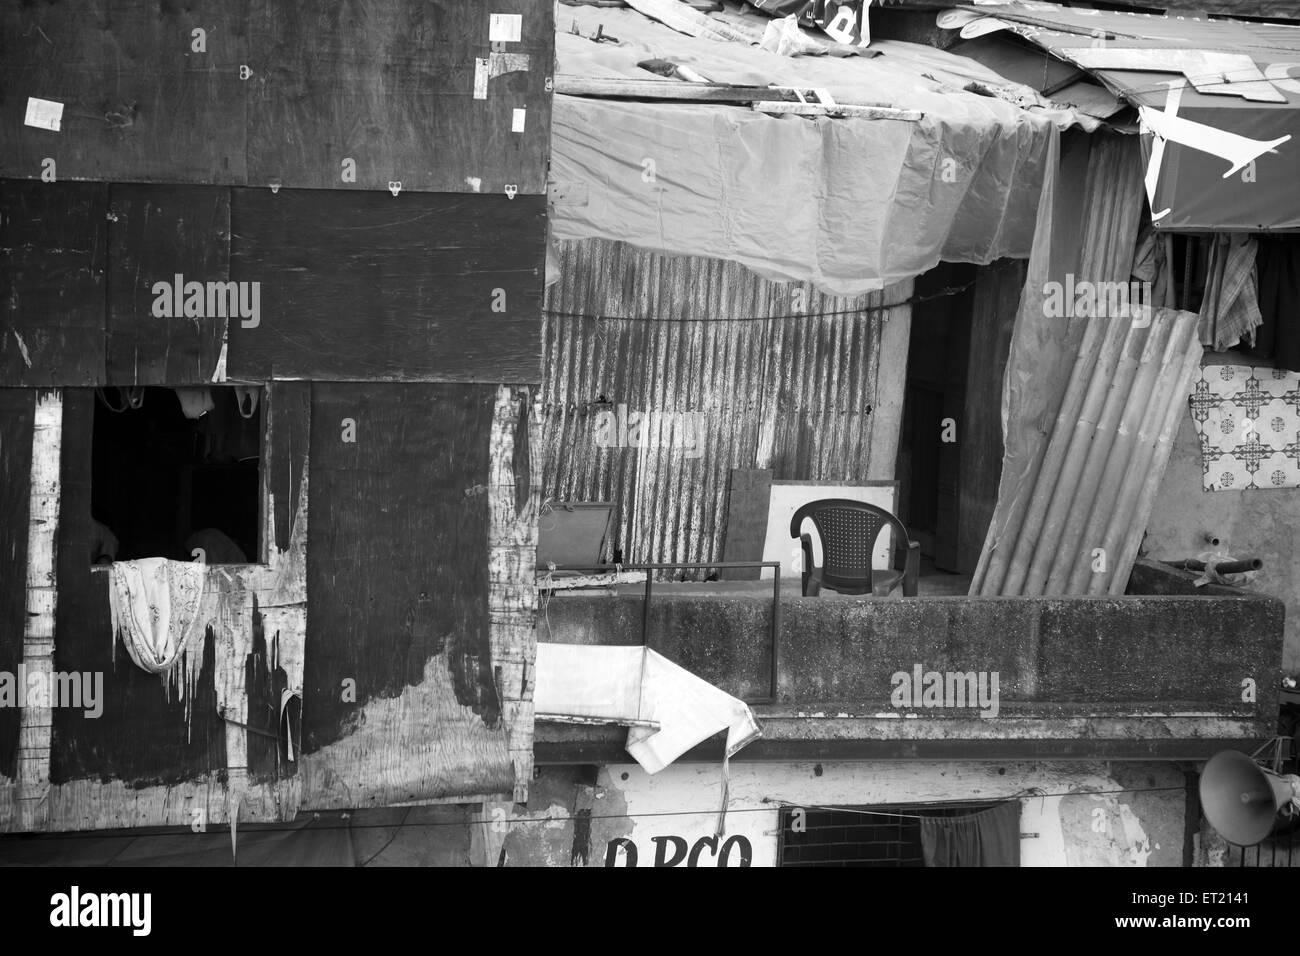 Slum Behram Naupada at Anant Kanekar Marg ; Bandra ; Bombay Mumbai ; Maharashtra ; India 17 September 2009 - Stock Image